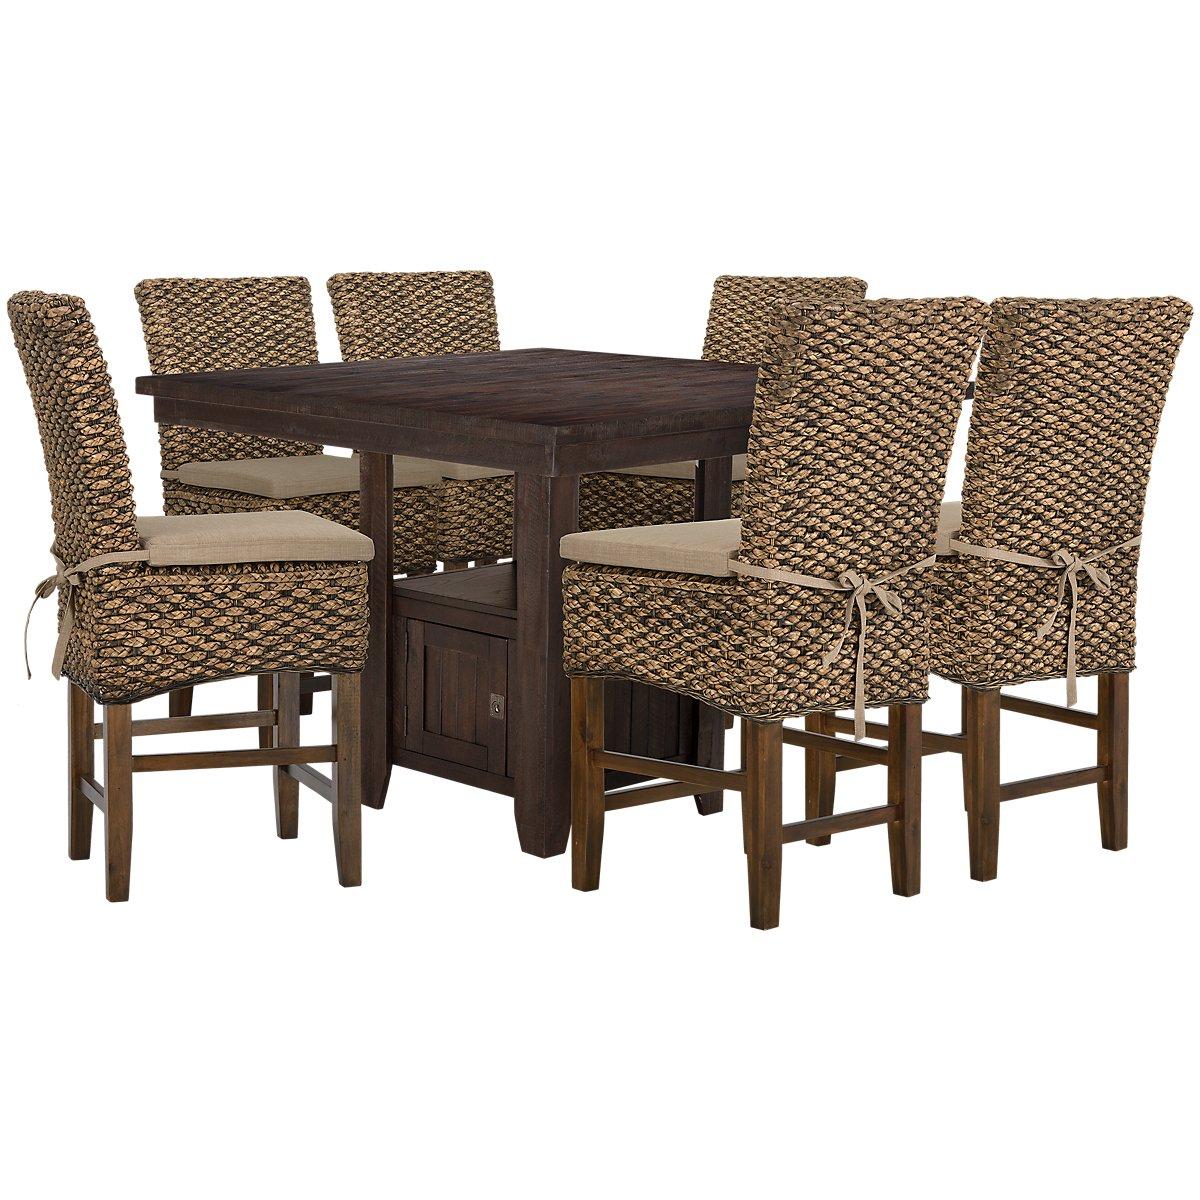 Kona Grove Dark Tone Wood High Table & 4 Woven Barstools